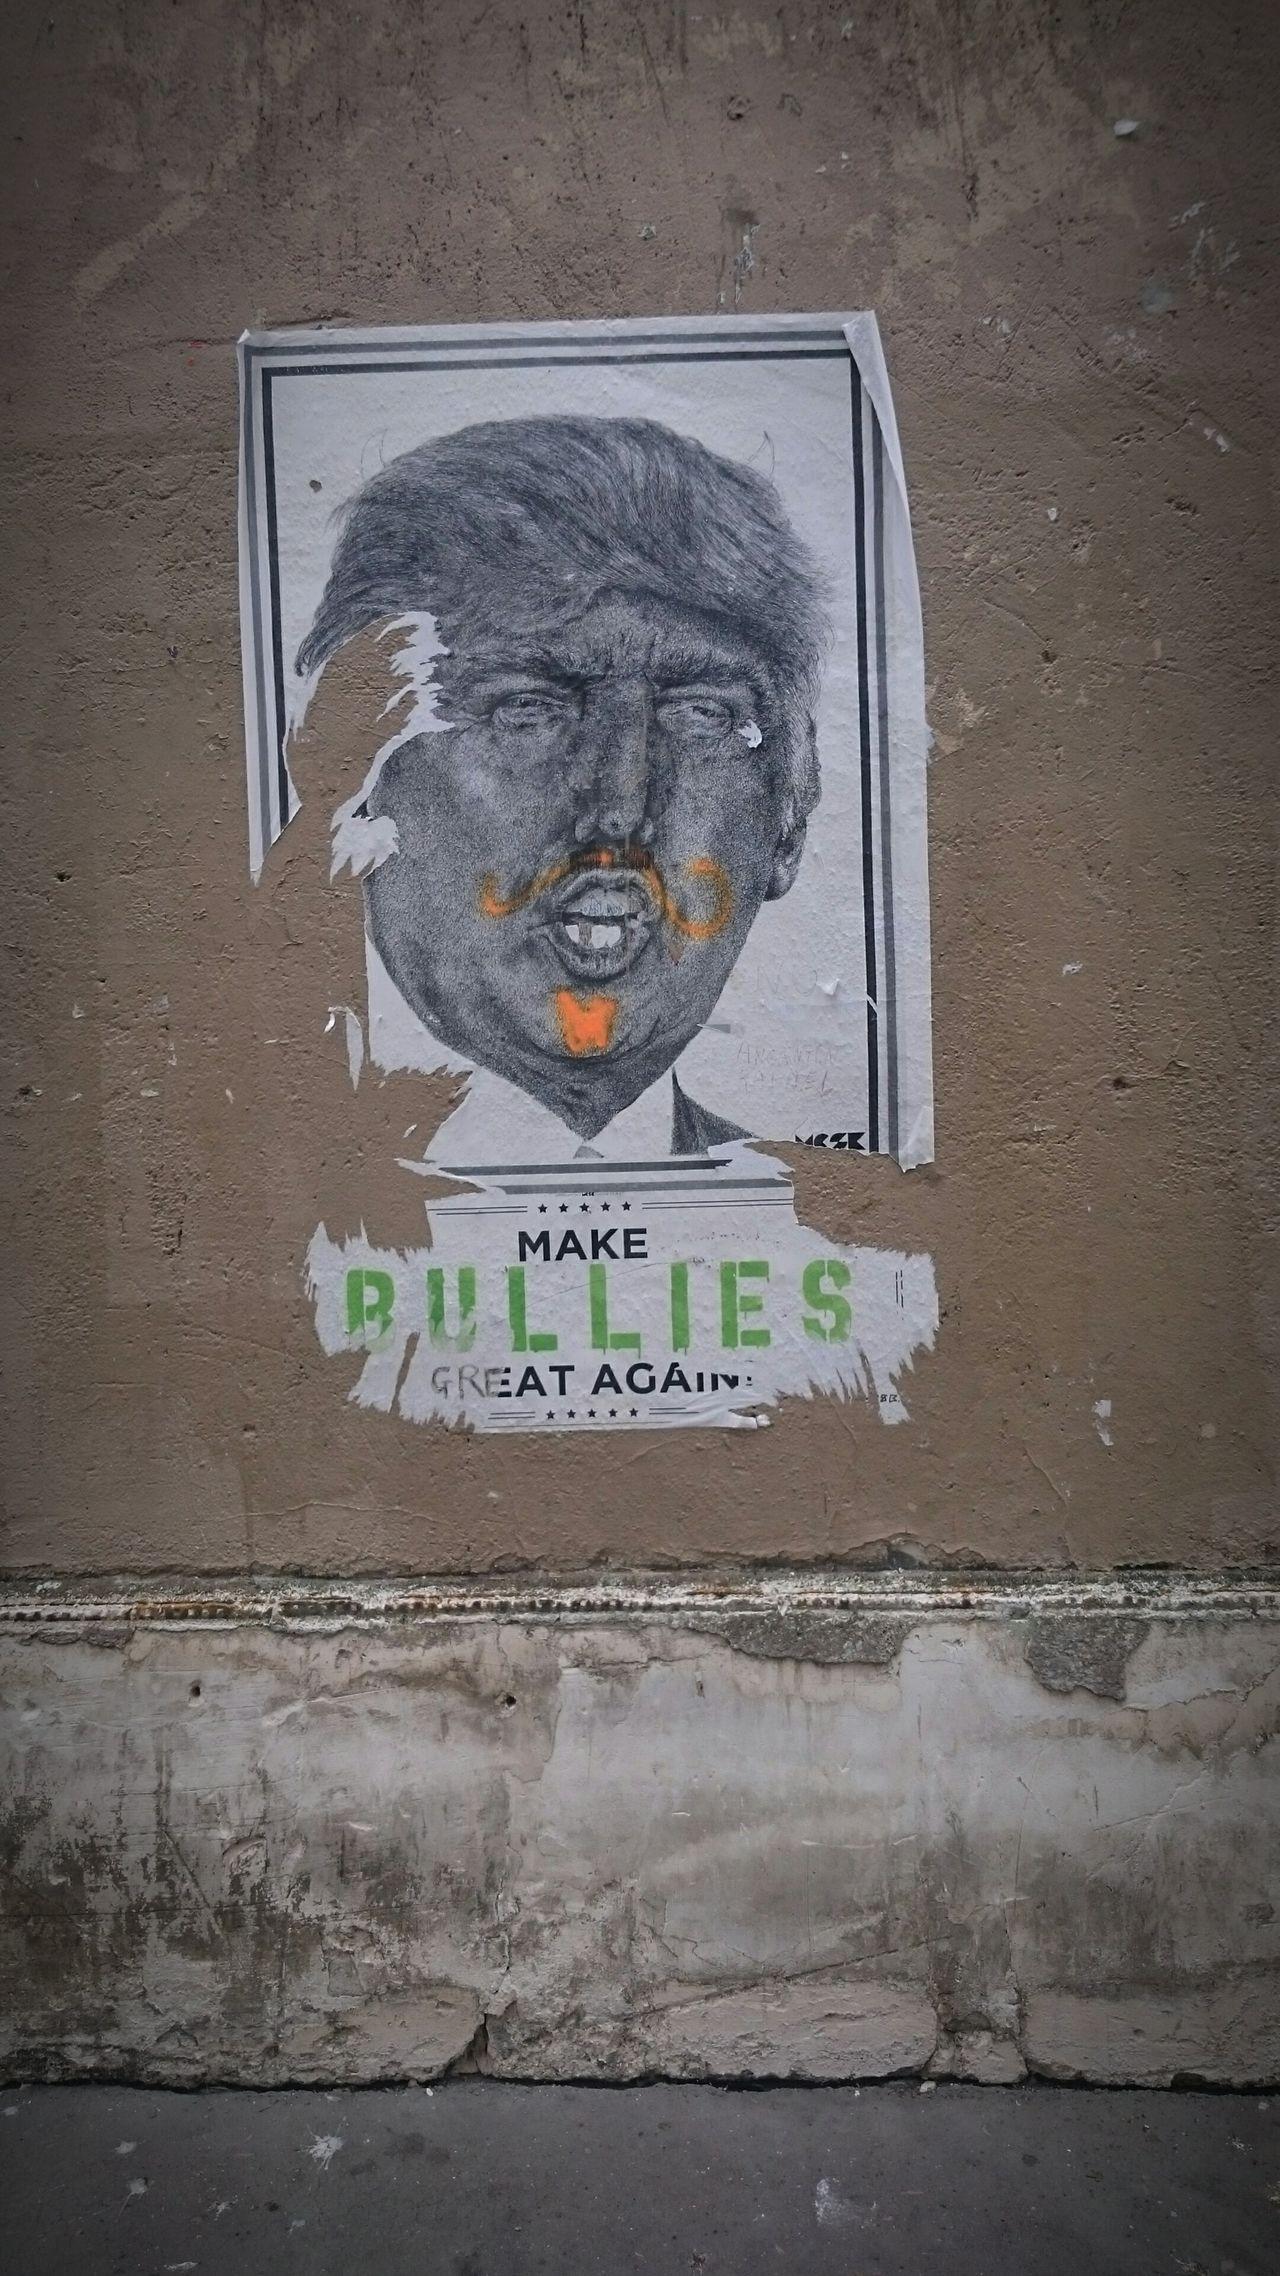 Paris Political Street Art Politics Donald Trump Street Art Us Election